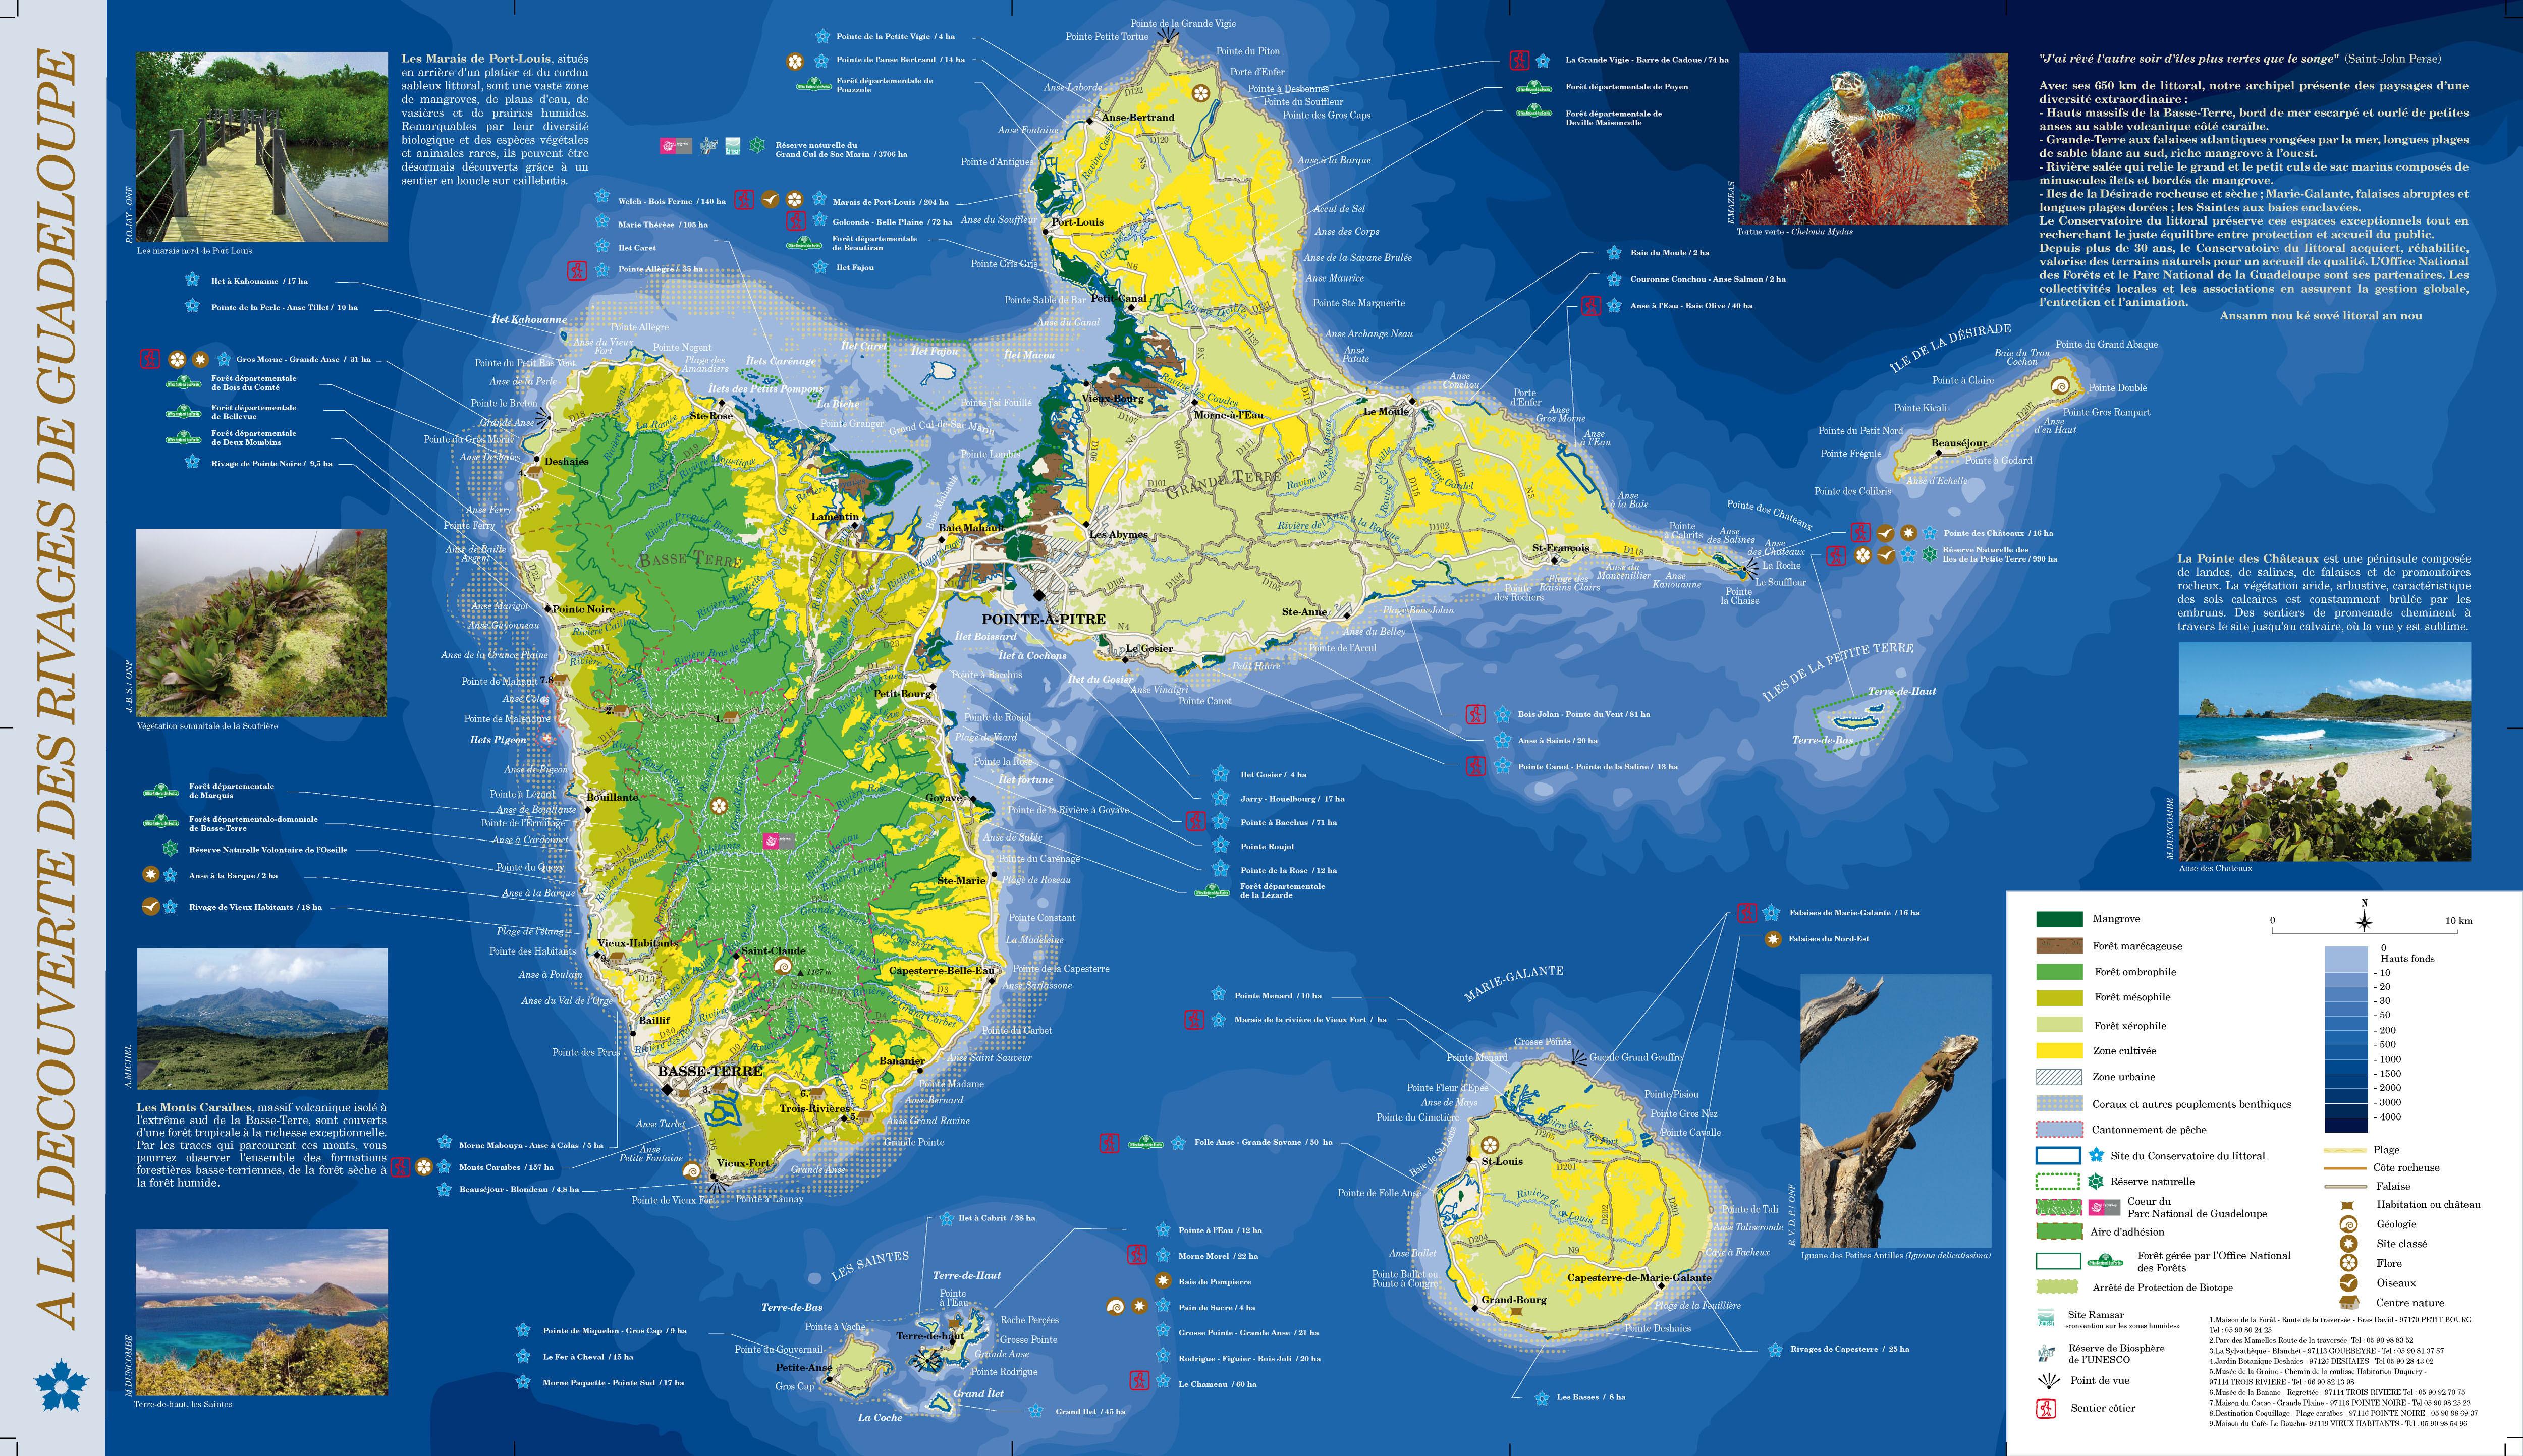 Grande carte touristique de la Guadeloupe